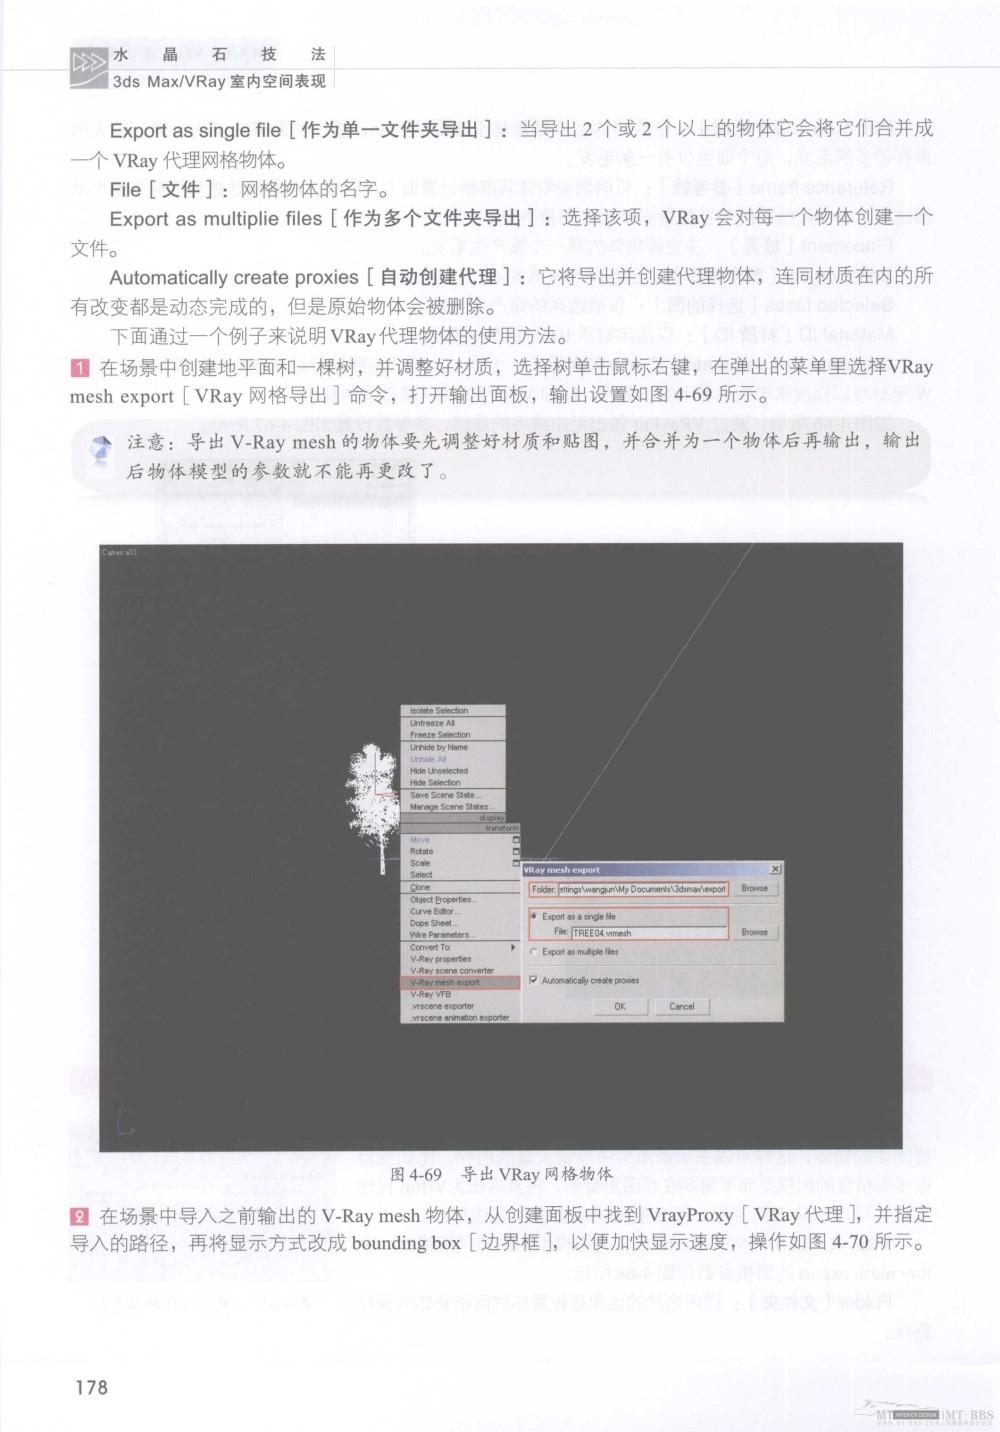 水晶石技法-3ds_Max&VRay室内空间表现_水晶石技法-3ds_Max&VRay室内空间表现_页面_184.jpg